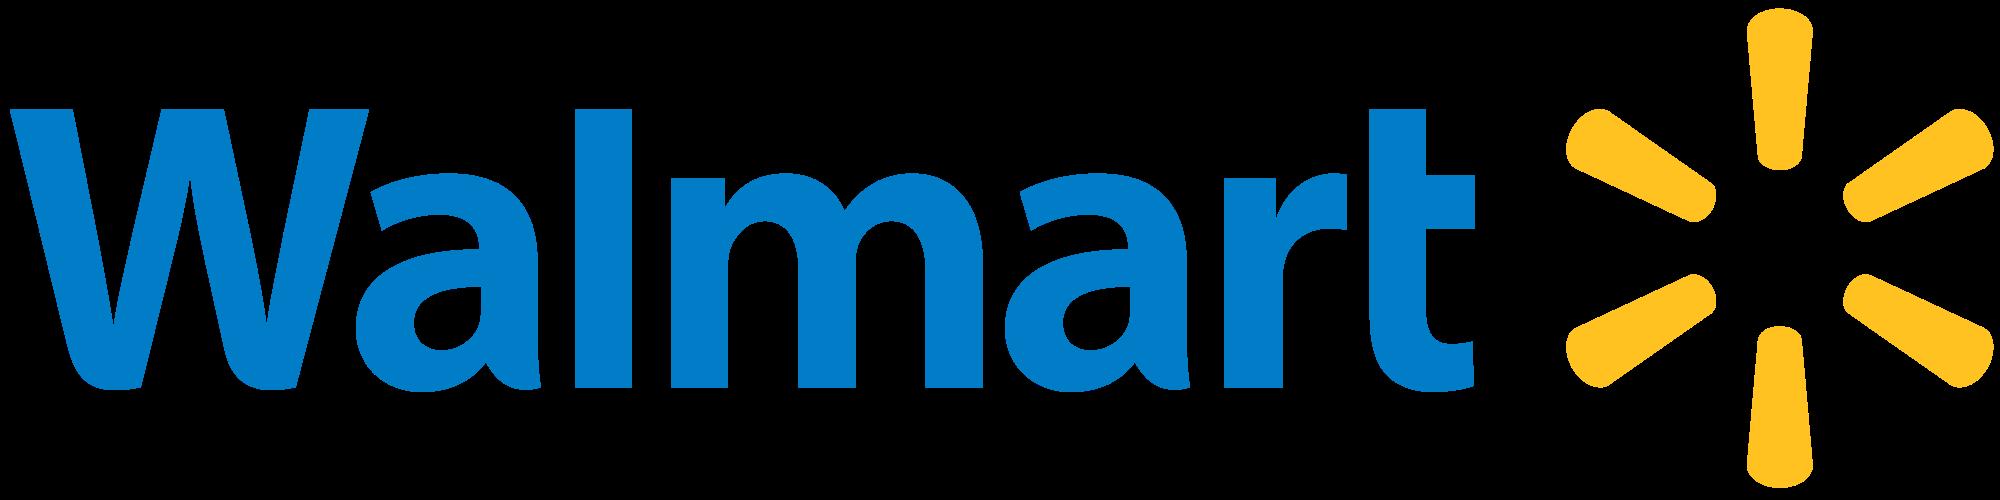 Walmart_logo.svg